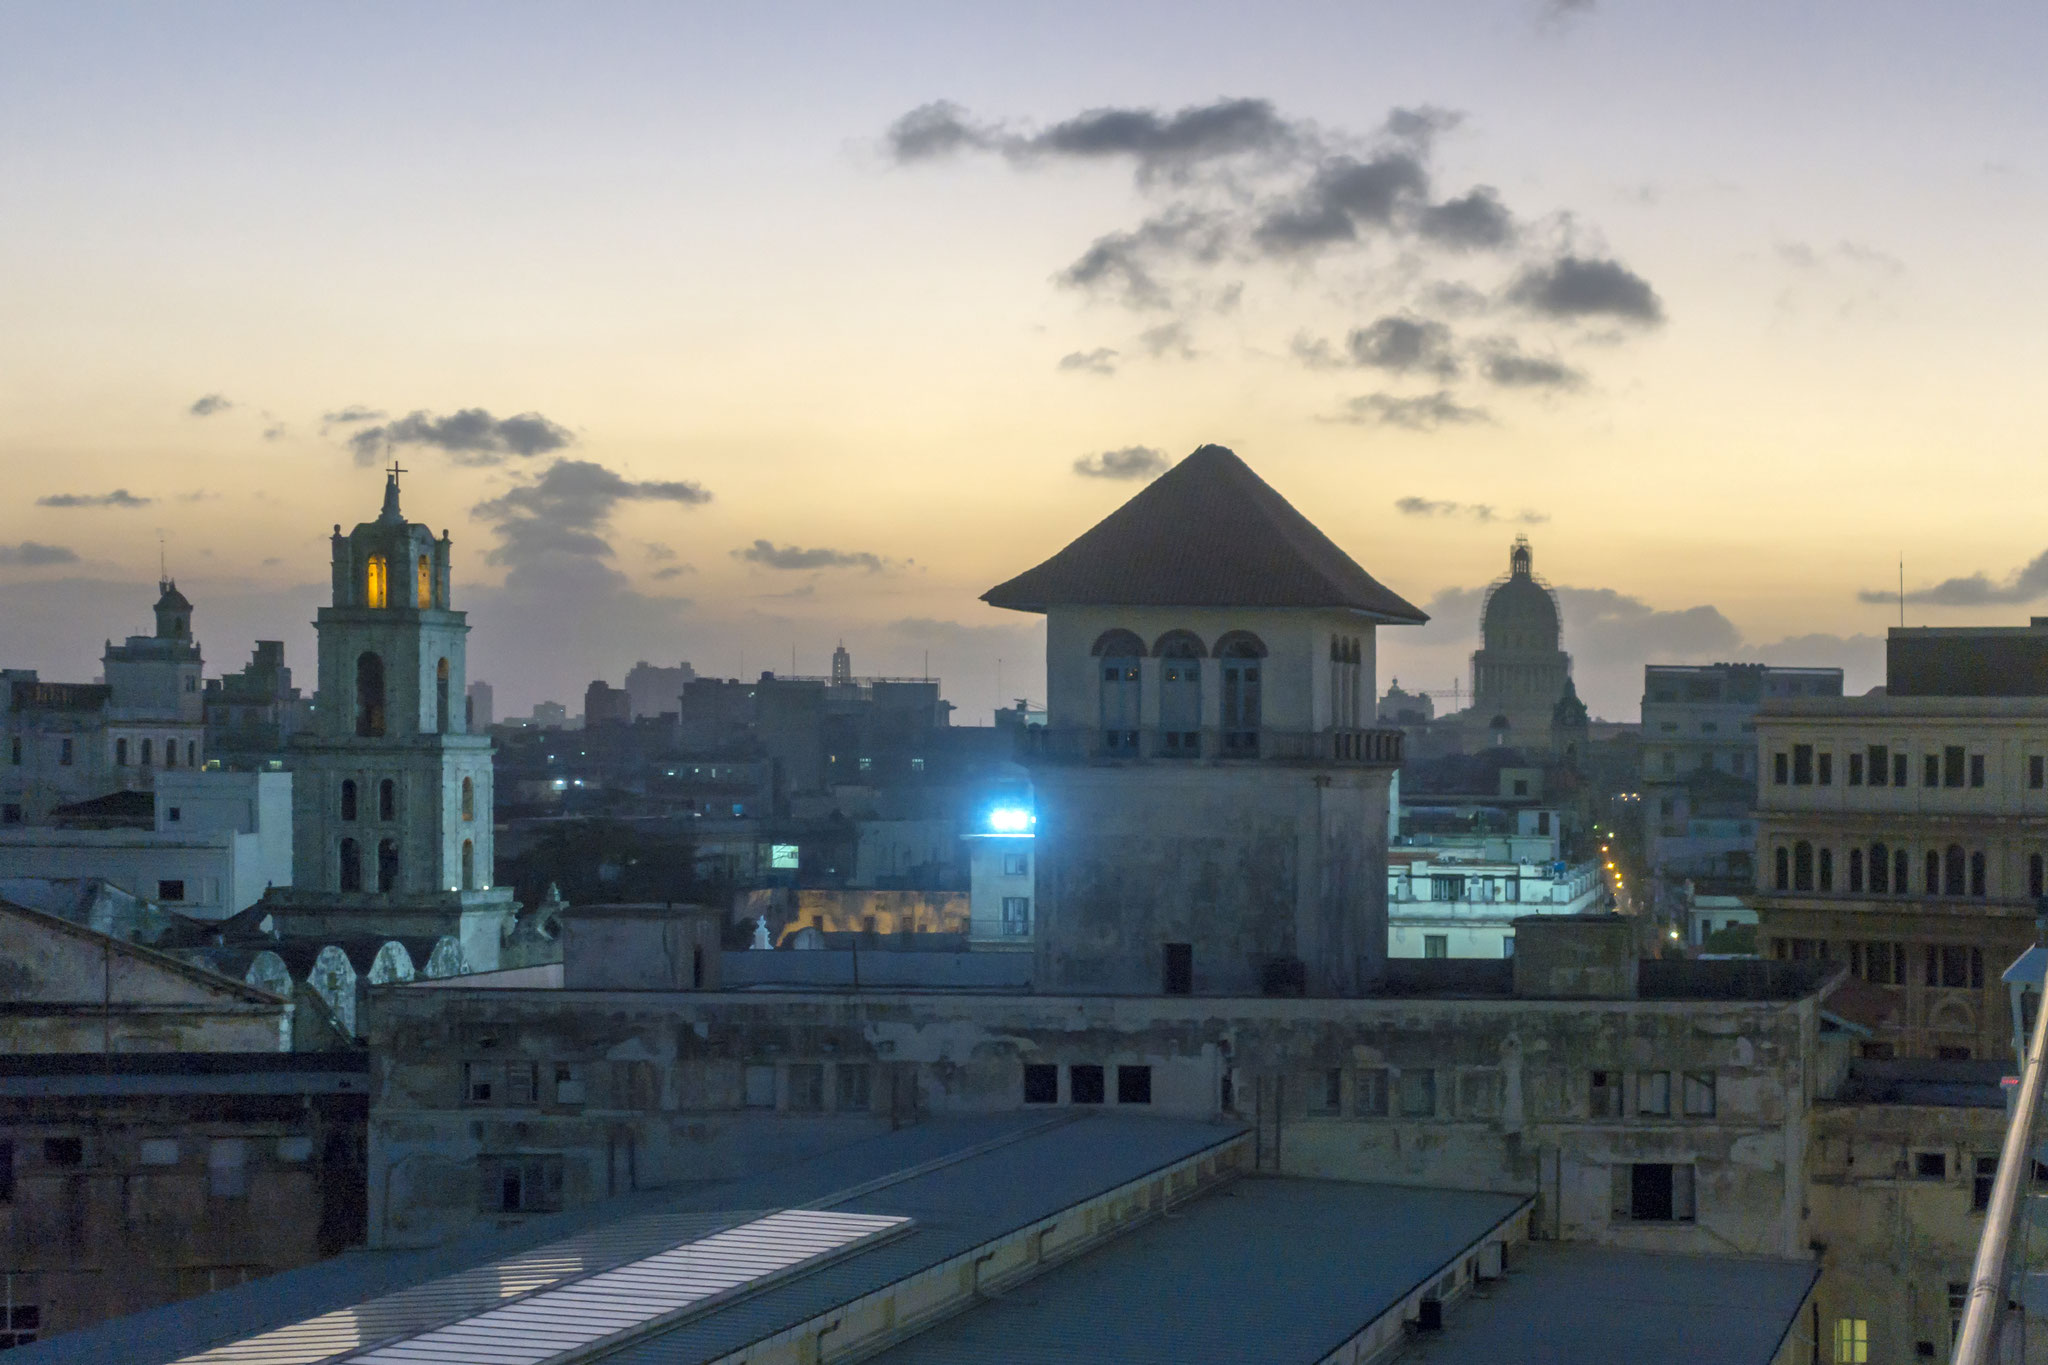 Hafengbäude Terminal de Cruceros de La Habana, Anleger für Kreuzfahrtschiffe